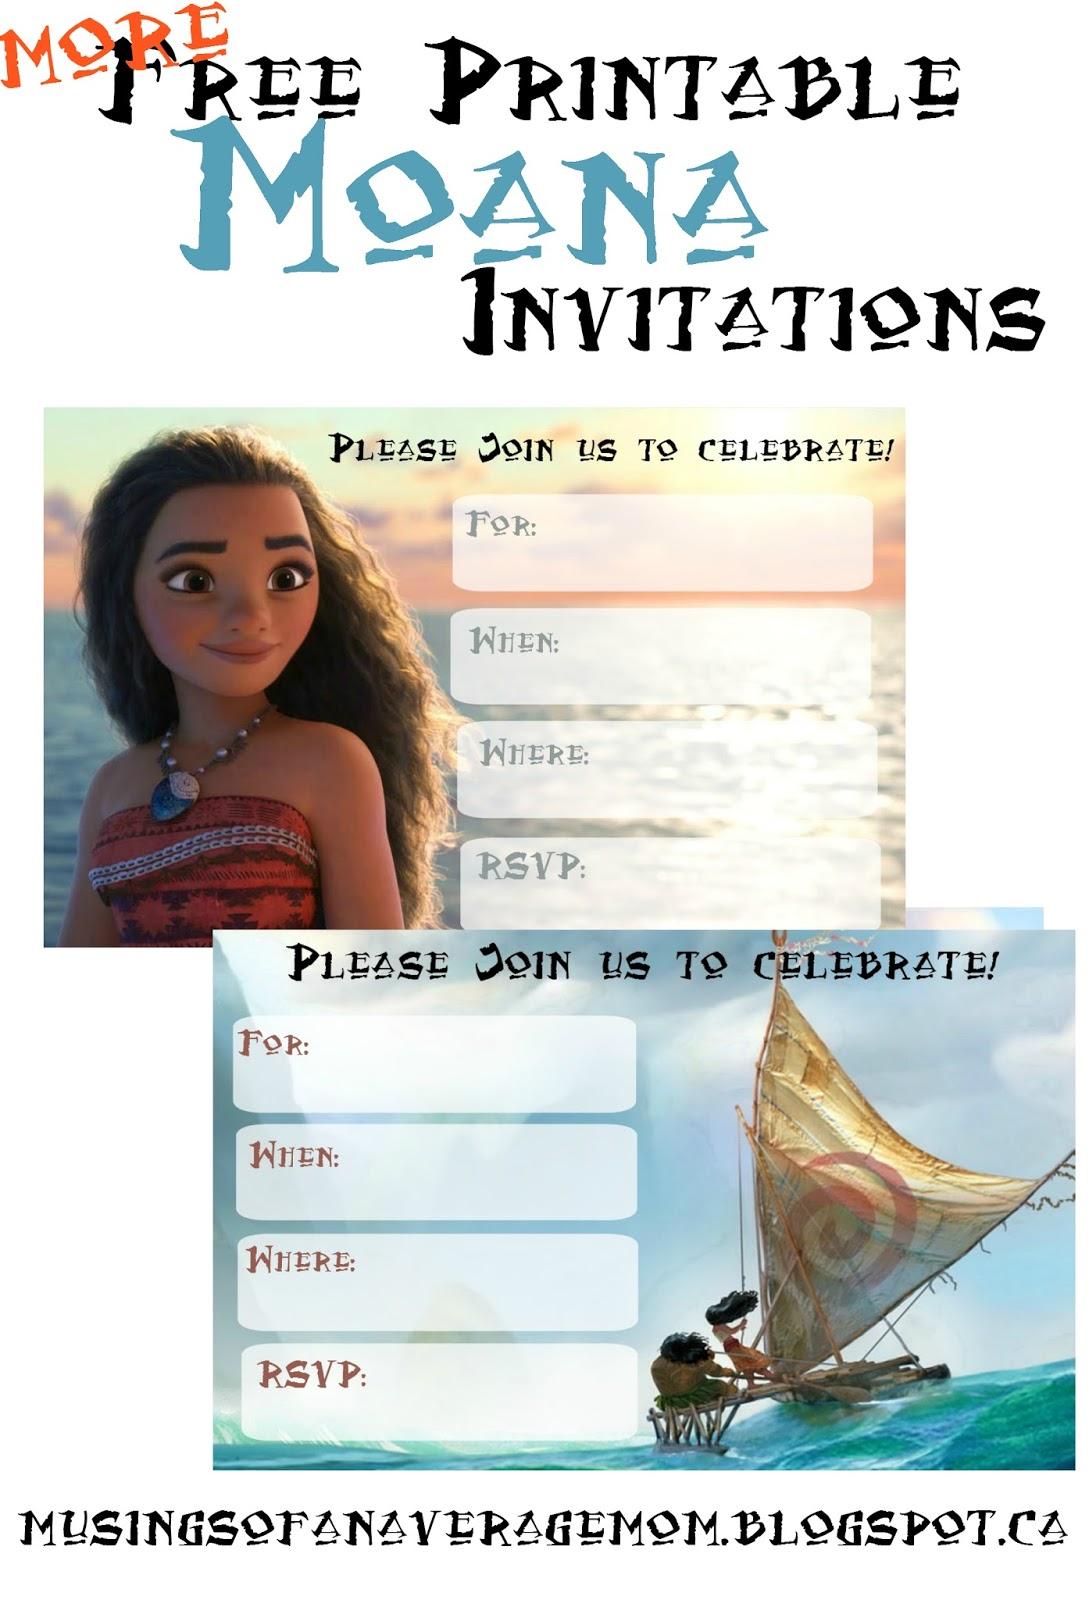 Musings of an average mom free printable moana invitations 2 for Printable moana invitations